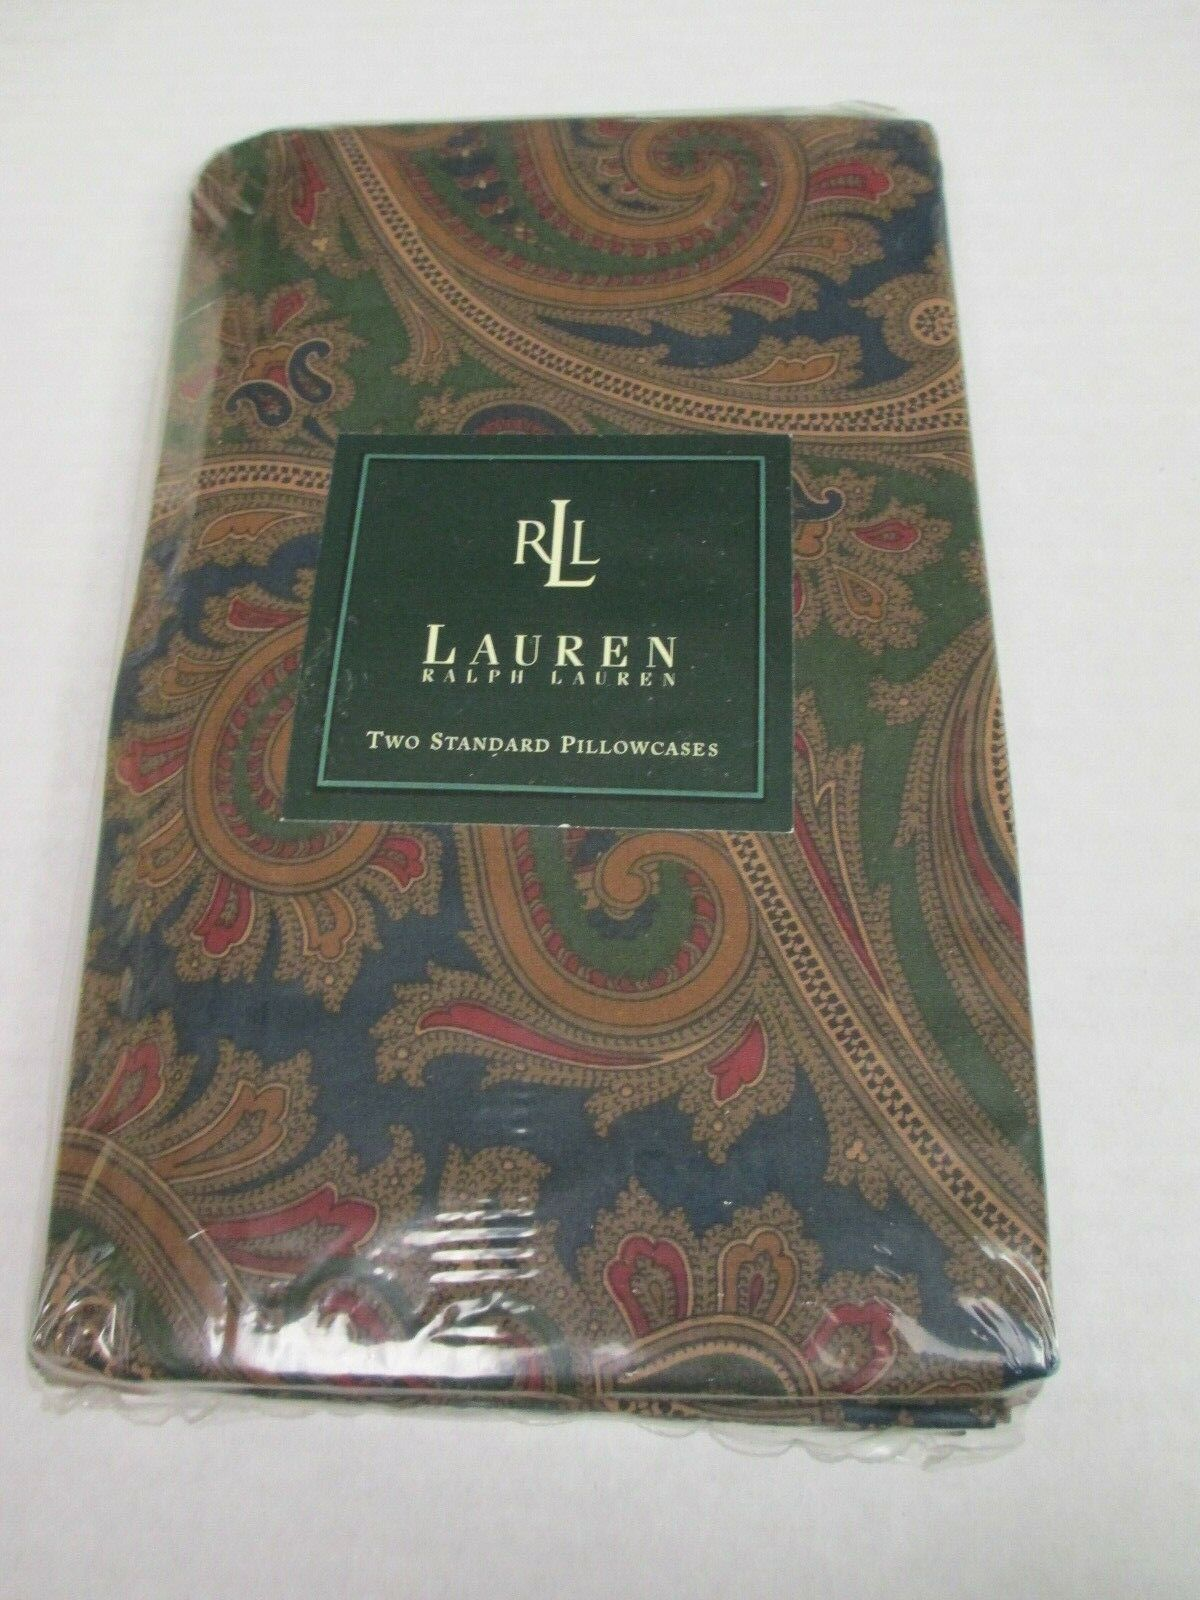 New Ralph Lauren Brianna Paisley rot Blau Grün 2 Floral Standard Pillowcases